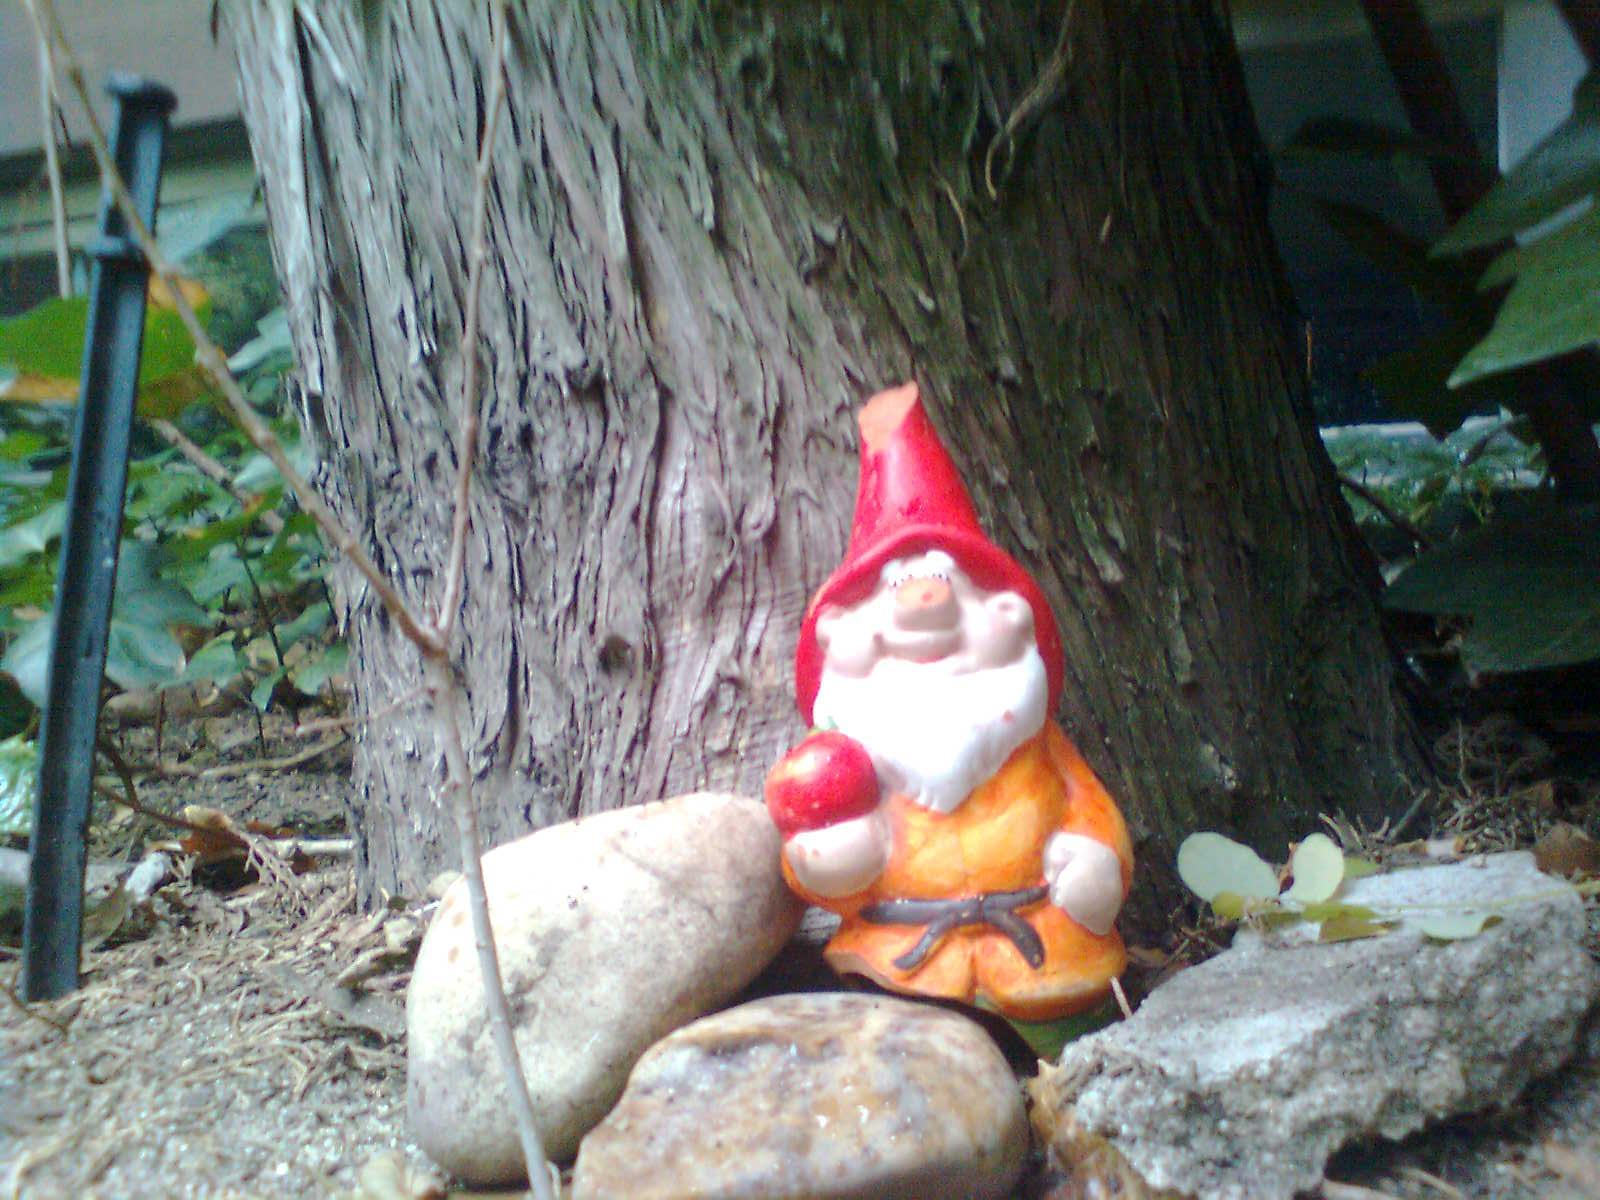 Segismundo el enano de jard n chamipedia wiki fandom for Enano jardin